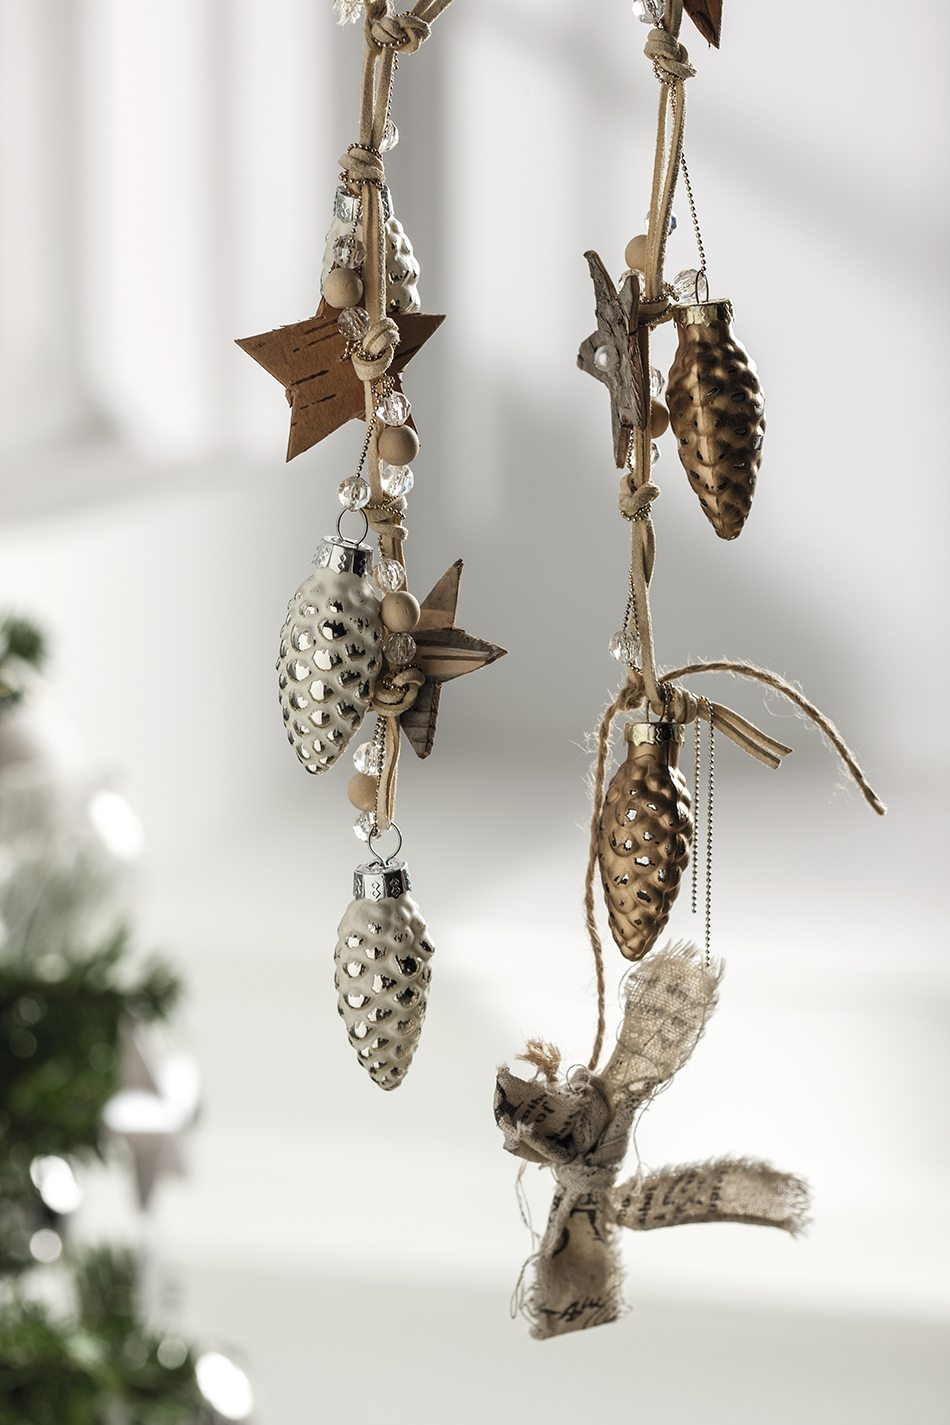 tendencias de decoración navideña guirnalda pina lm